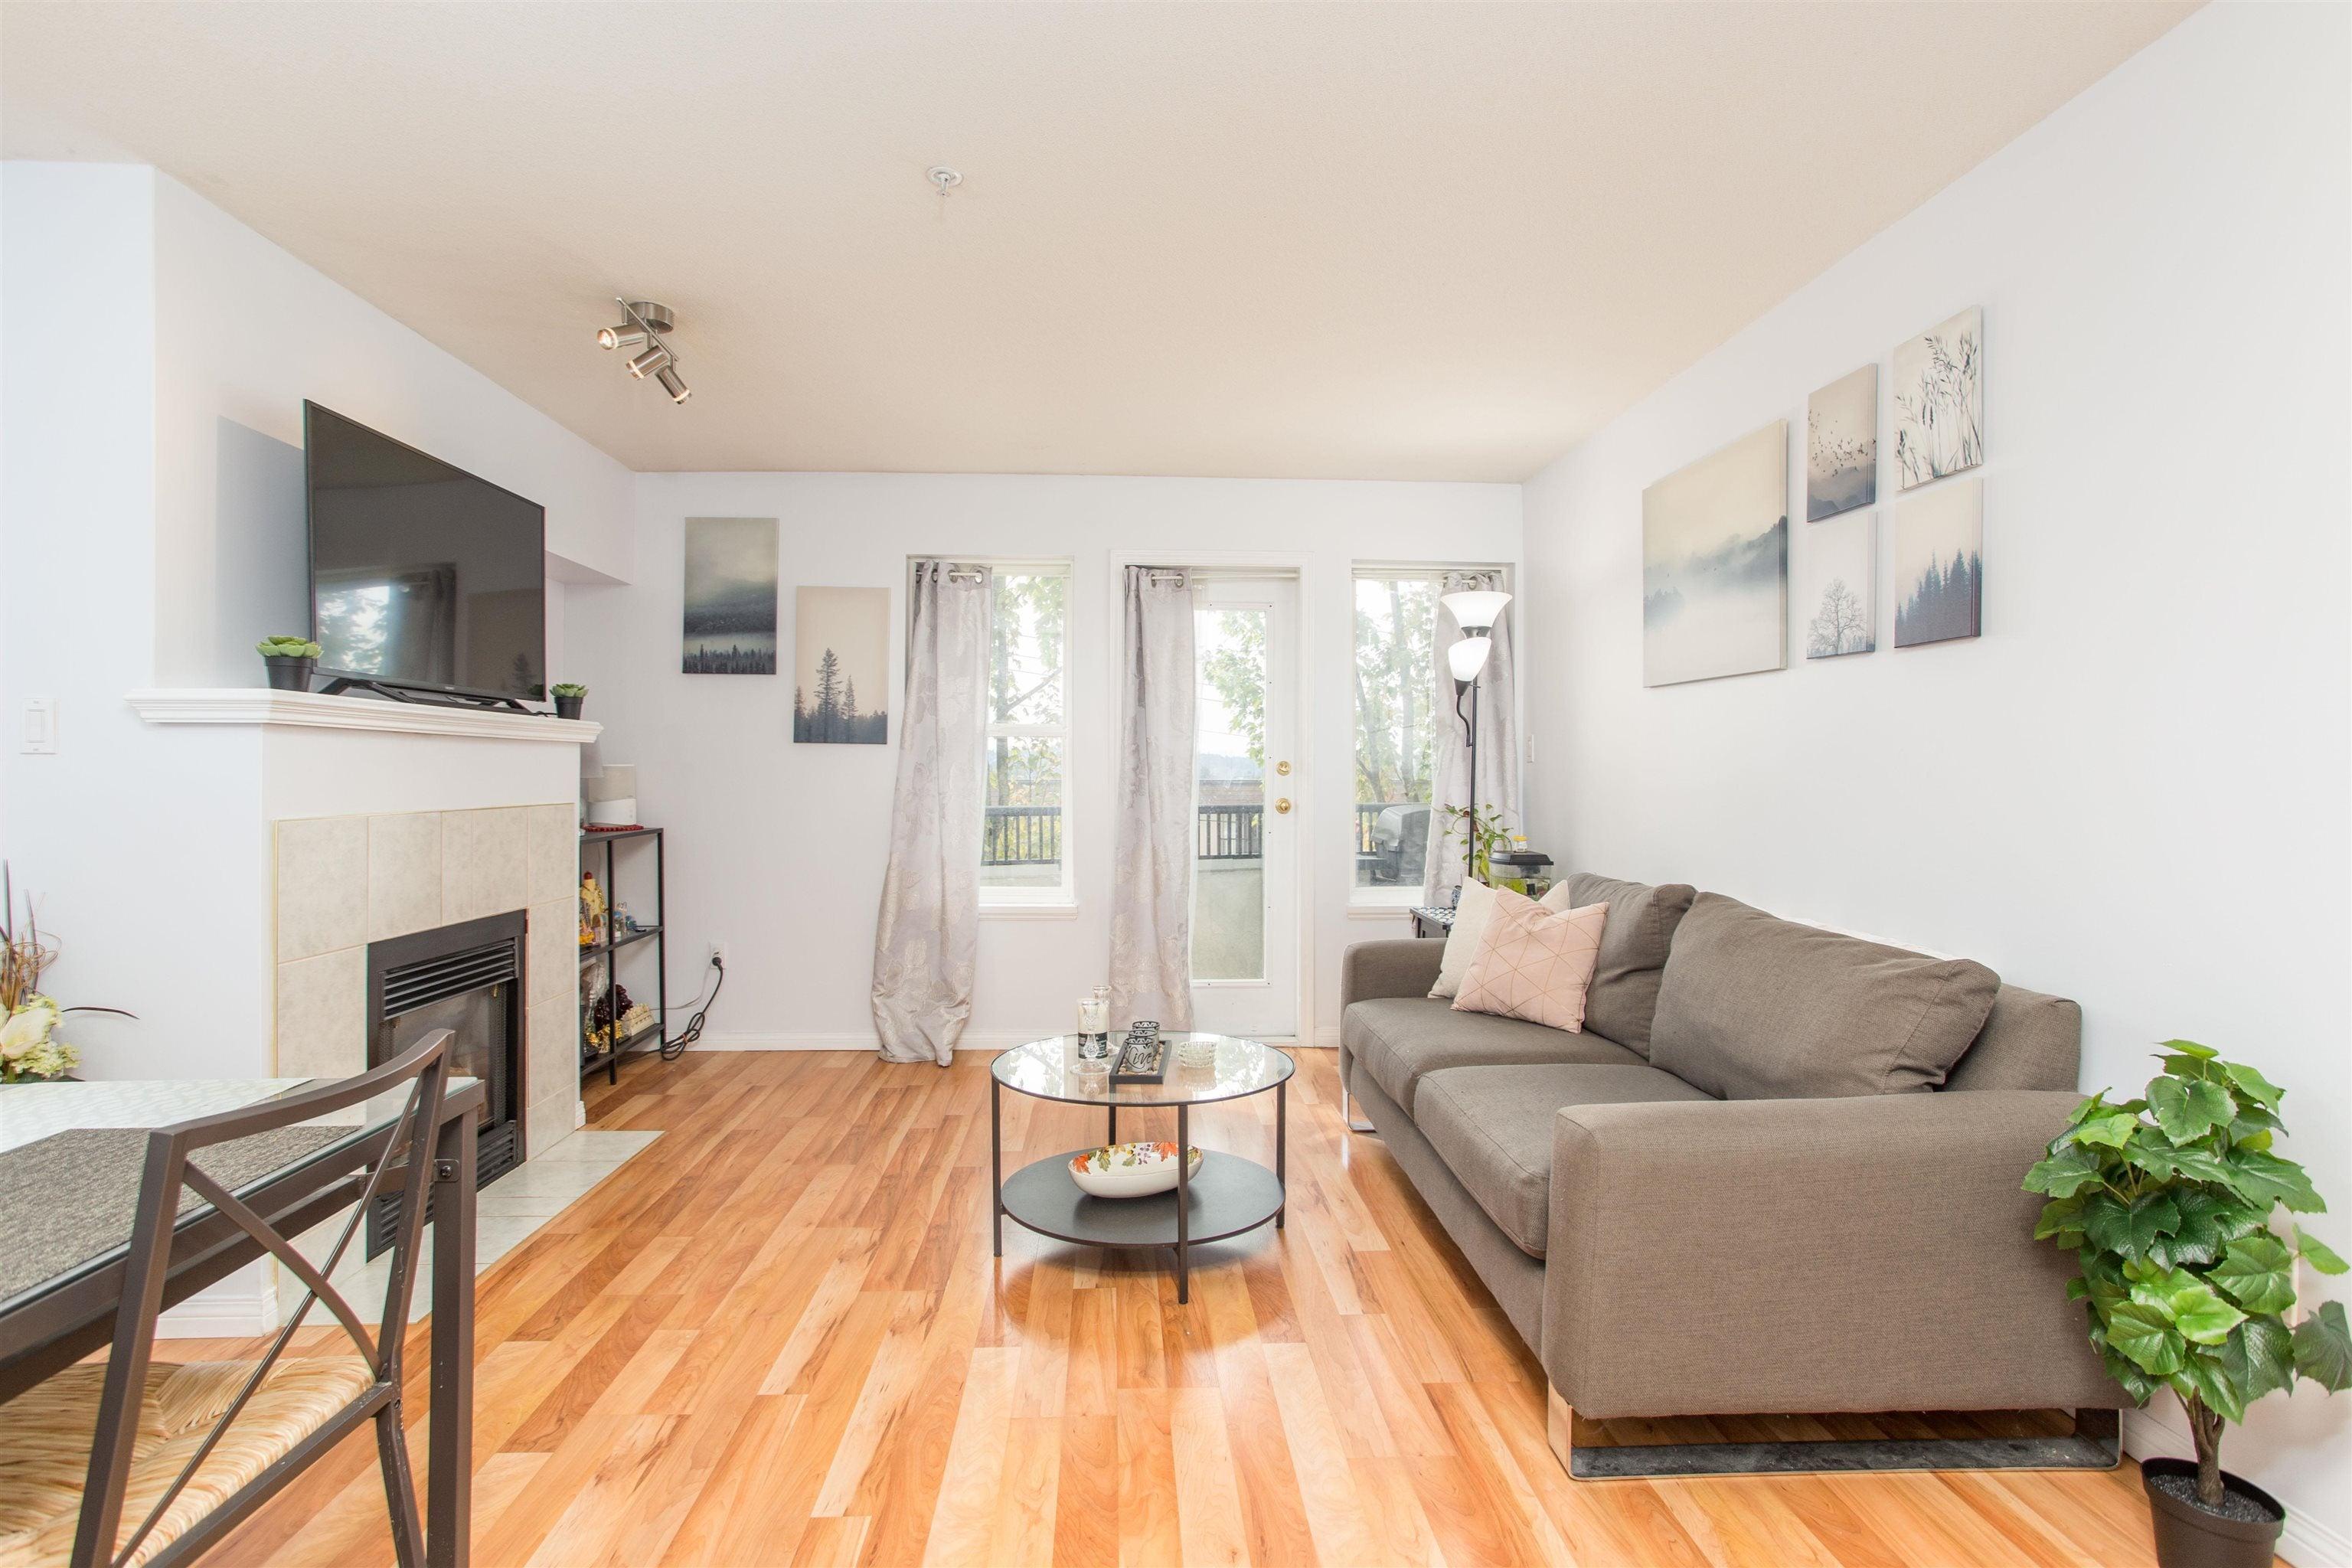 7 205 LEBLEU STREET - Maillardville Apartment/Condo for sale, 3 Bedrooms (R2625671) - #5